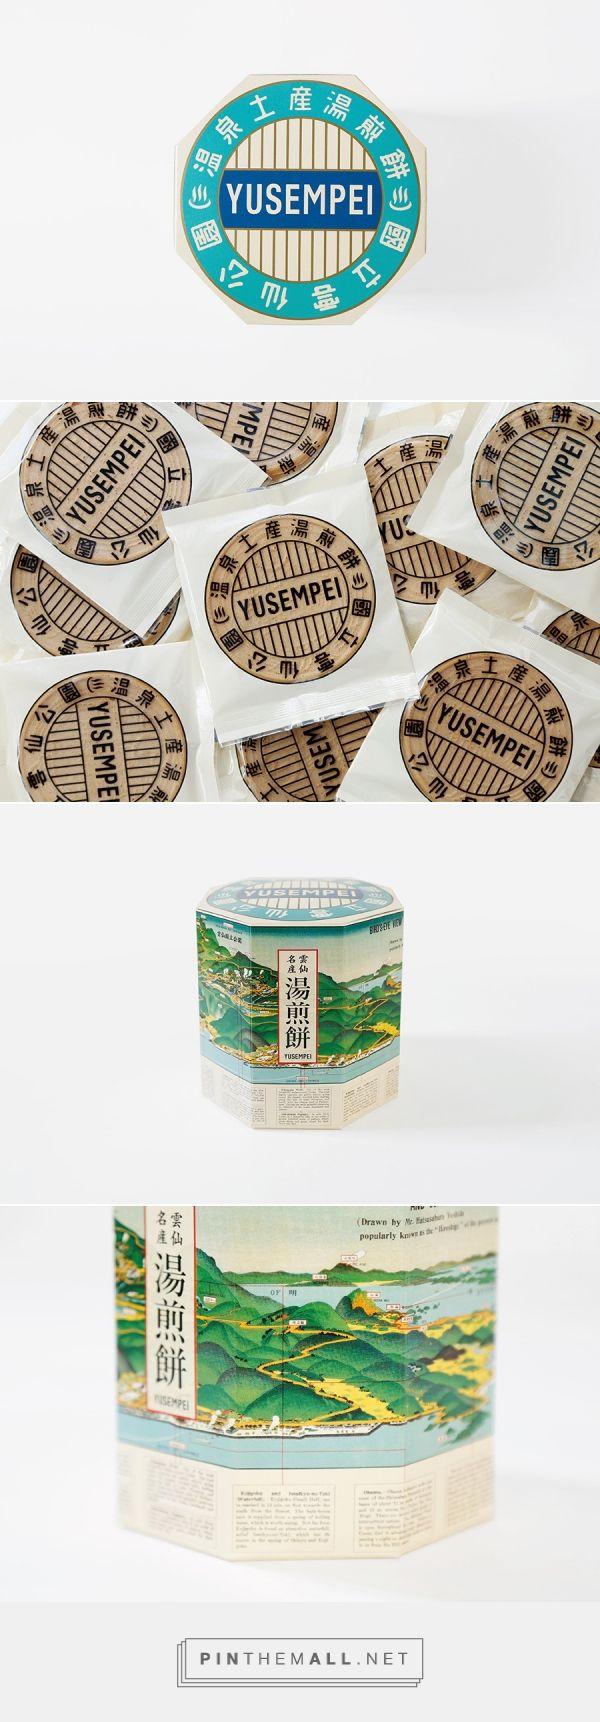 湯煎餅 - Daikoku Design Institute curated by Packaging Diva PD. AD+D. Daigo Daikoku/2014/Totoumiya Honpo Packaging.